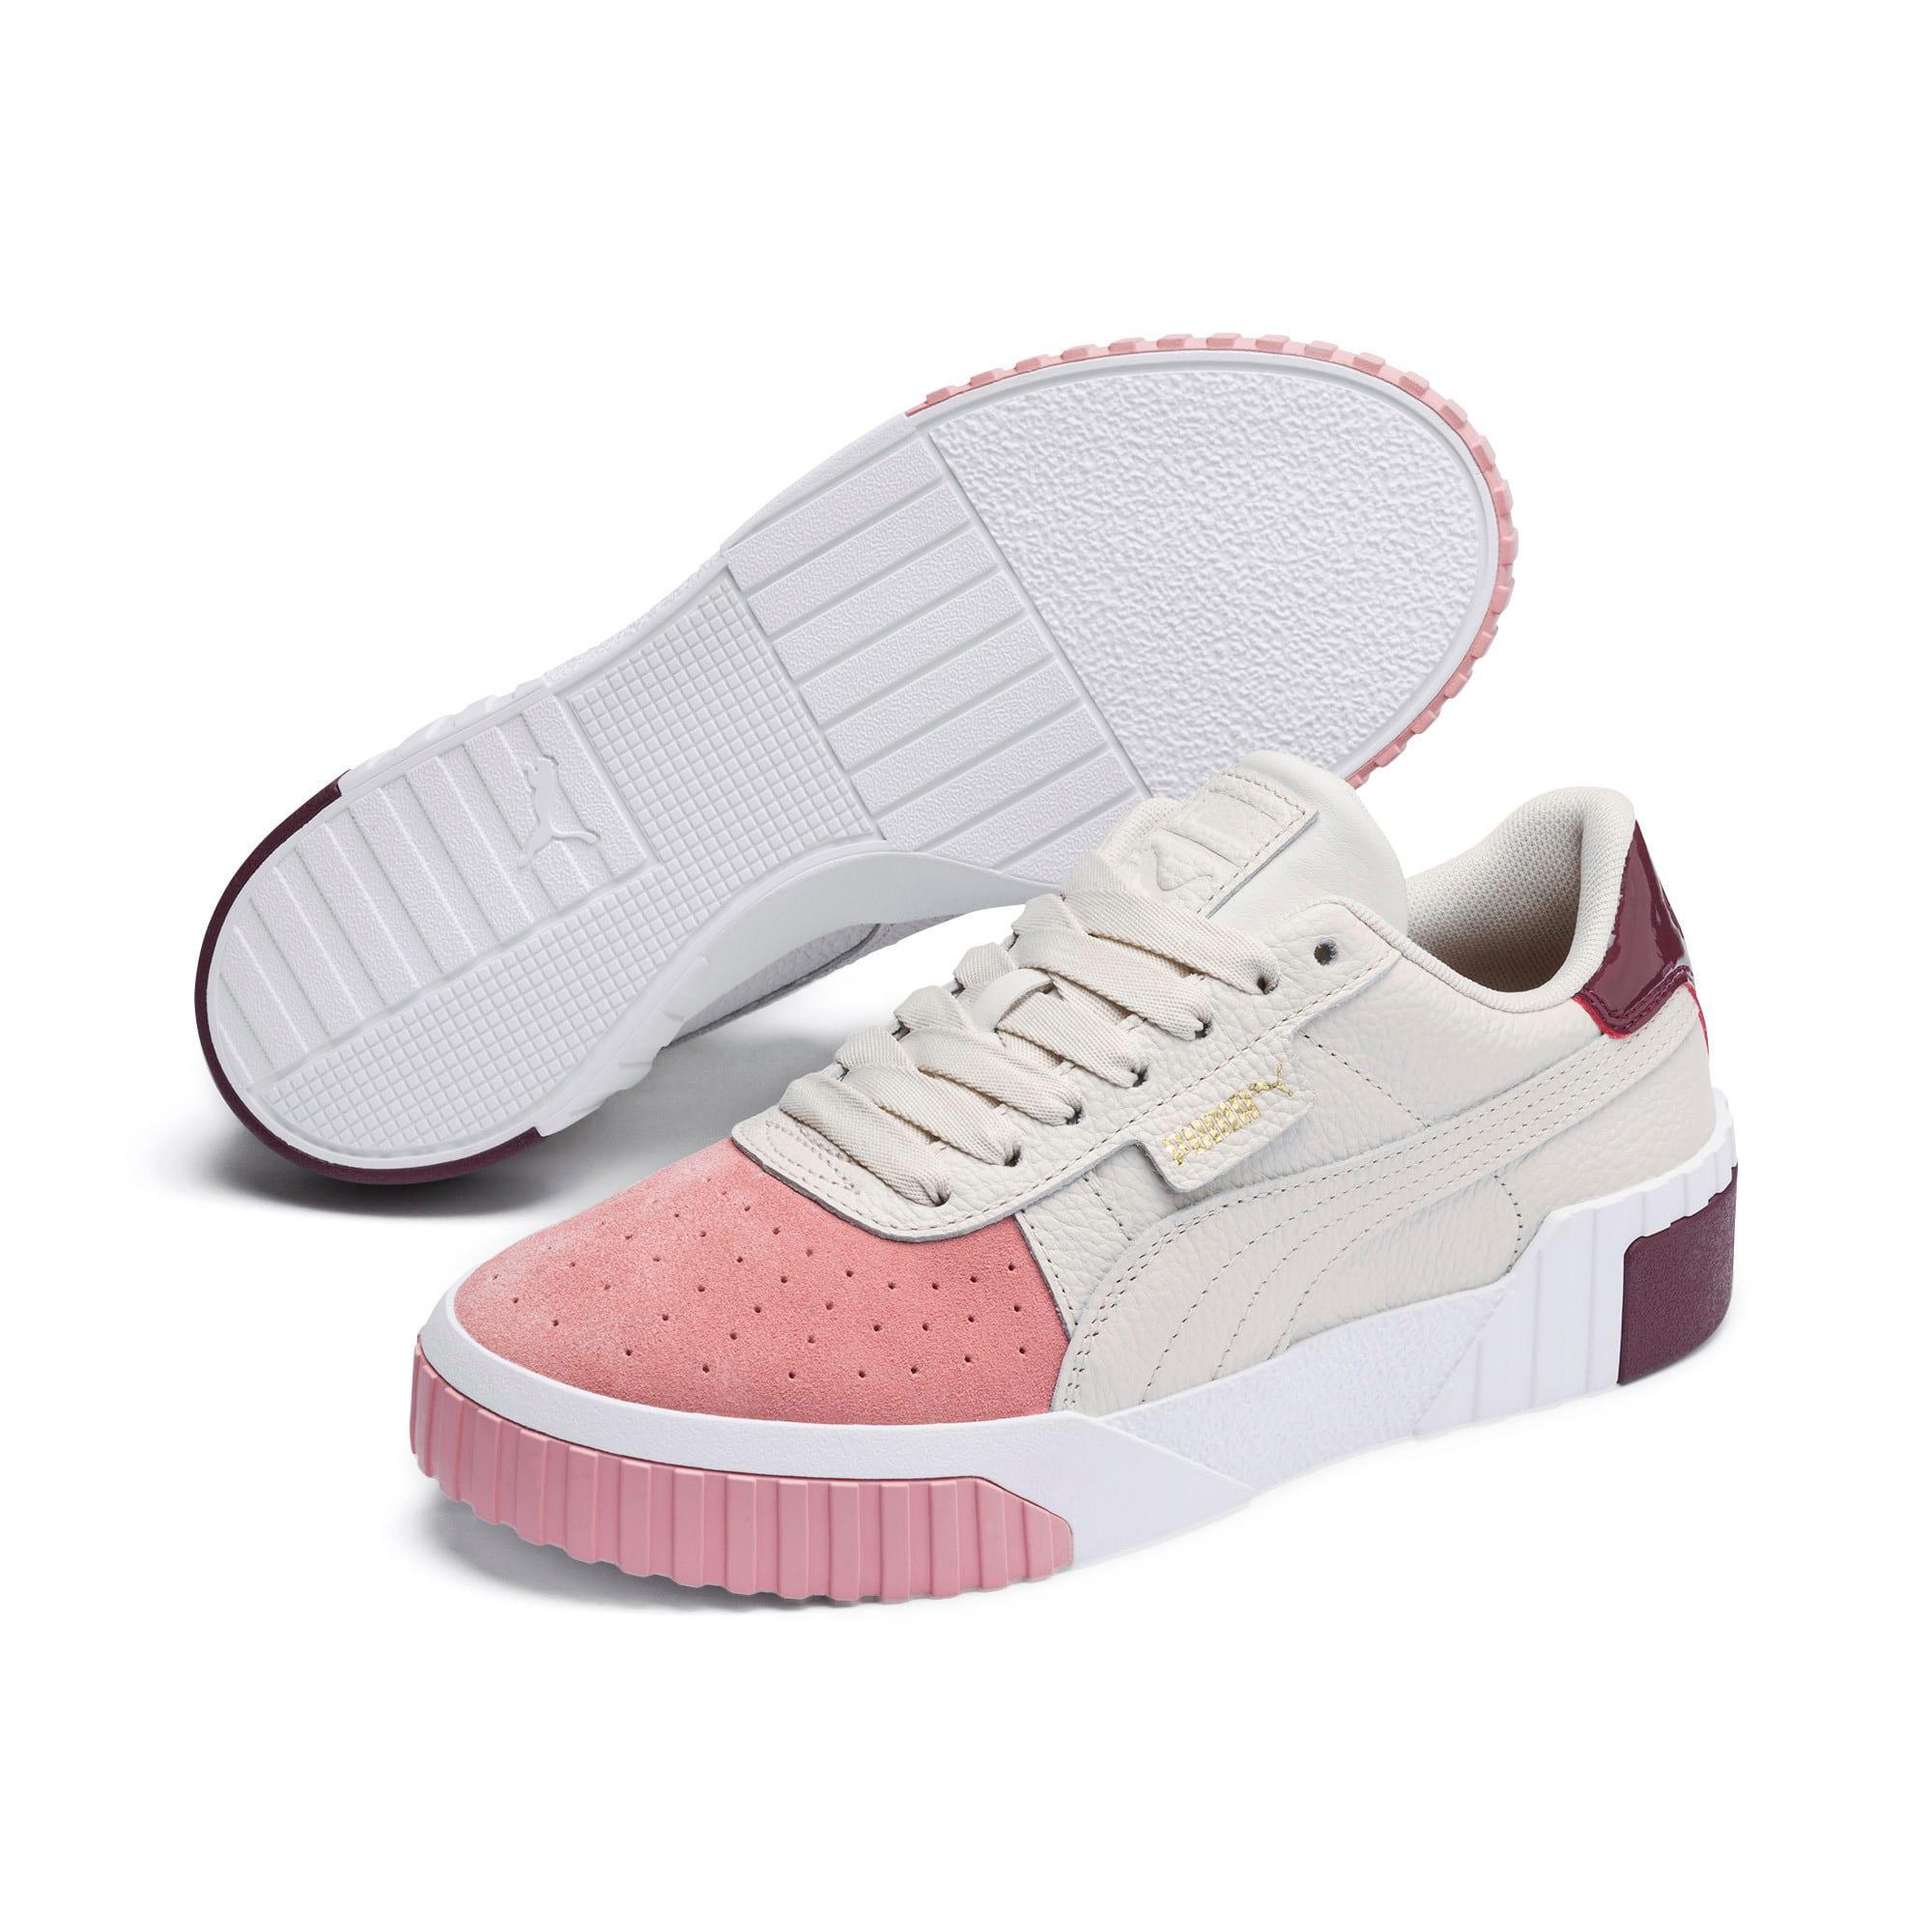 Thumbnail 3 of Cali Remix Women's Sneakers, Pastel Parchment-Bridal Rose, medium